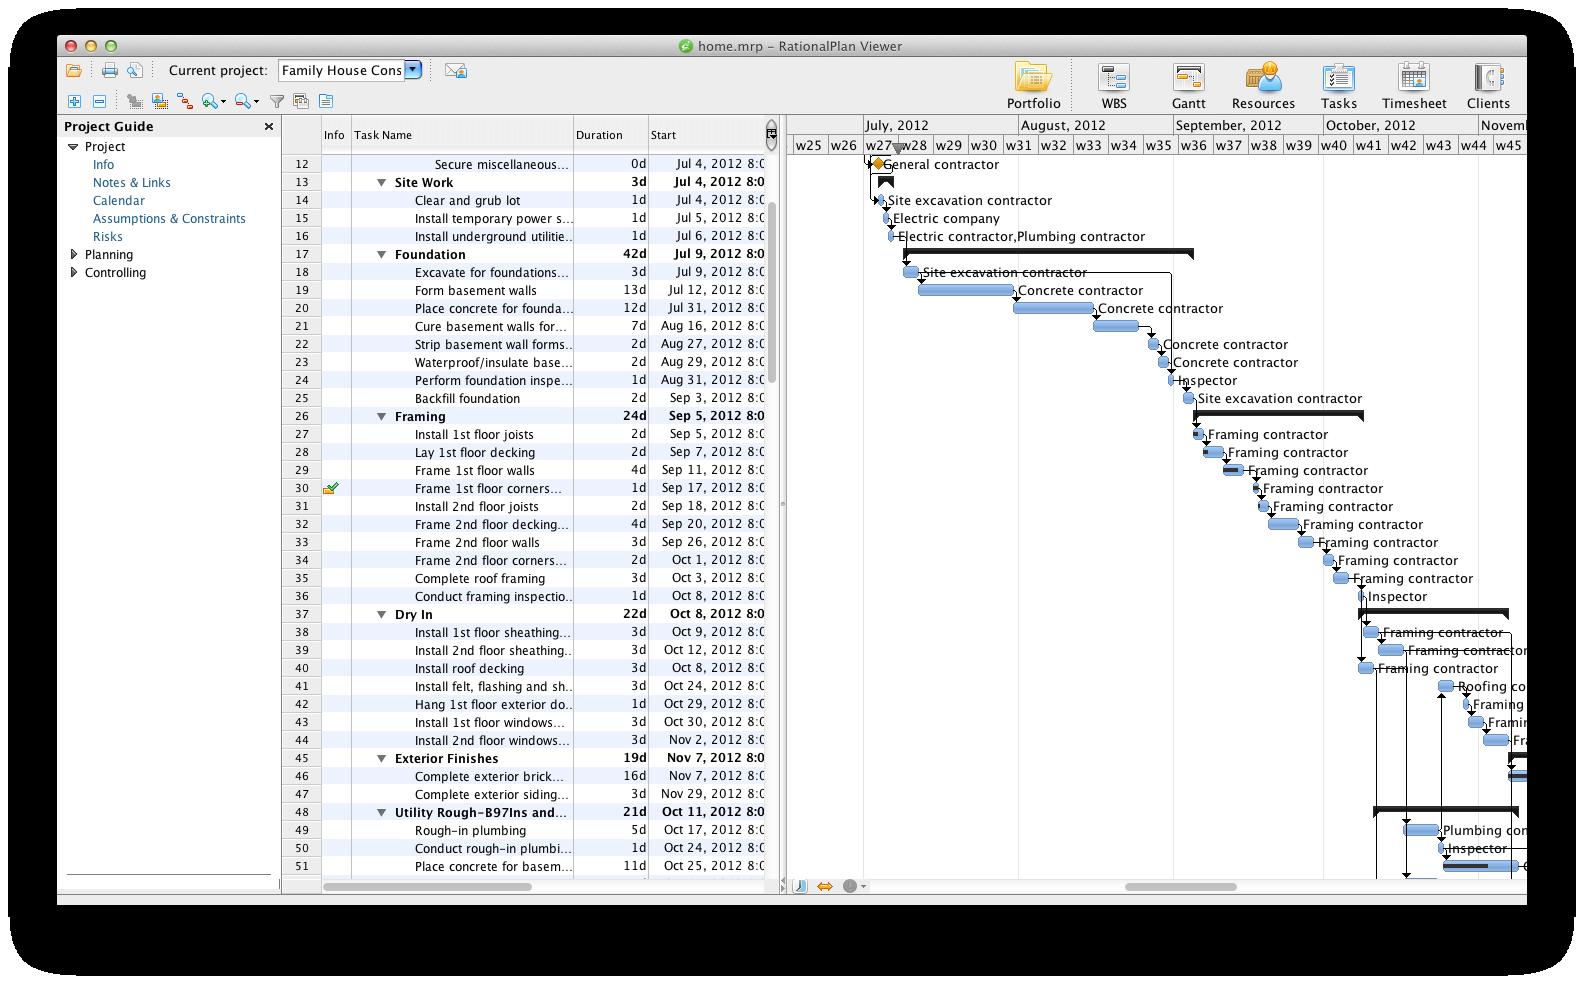 RationalPlan Project Viewer for Mac